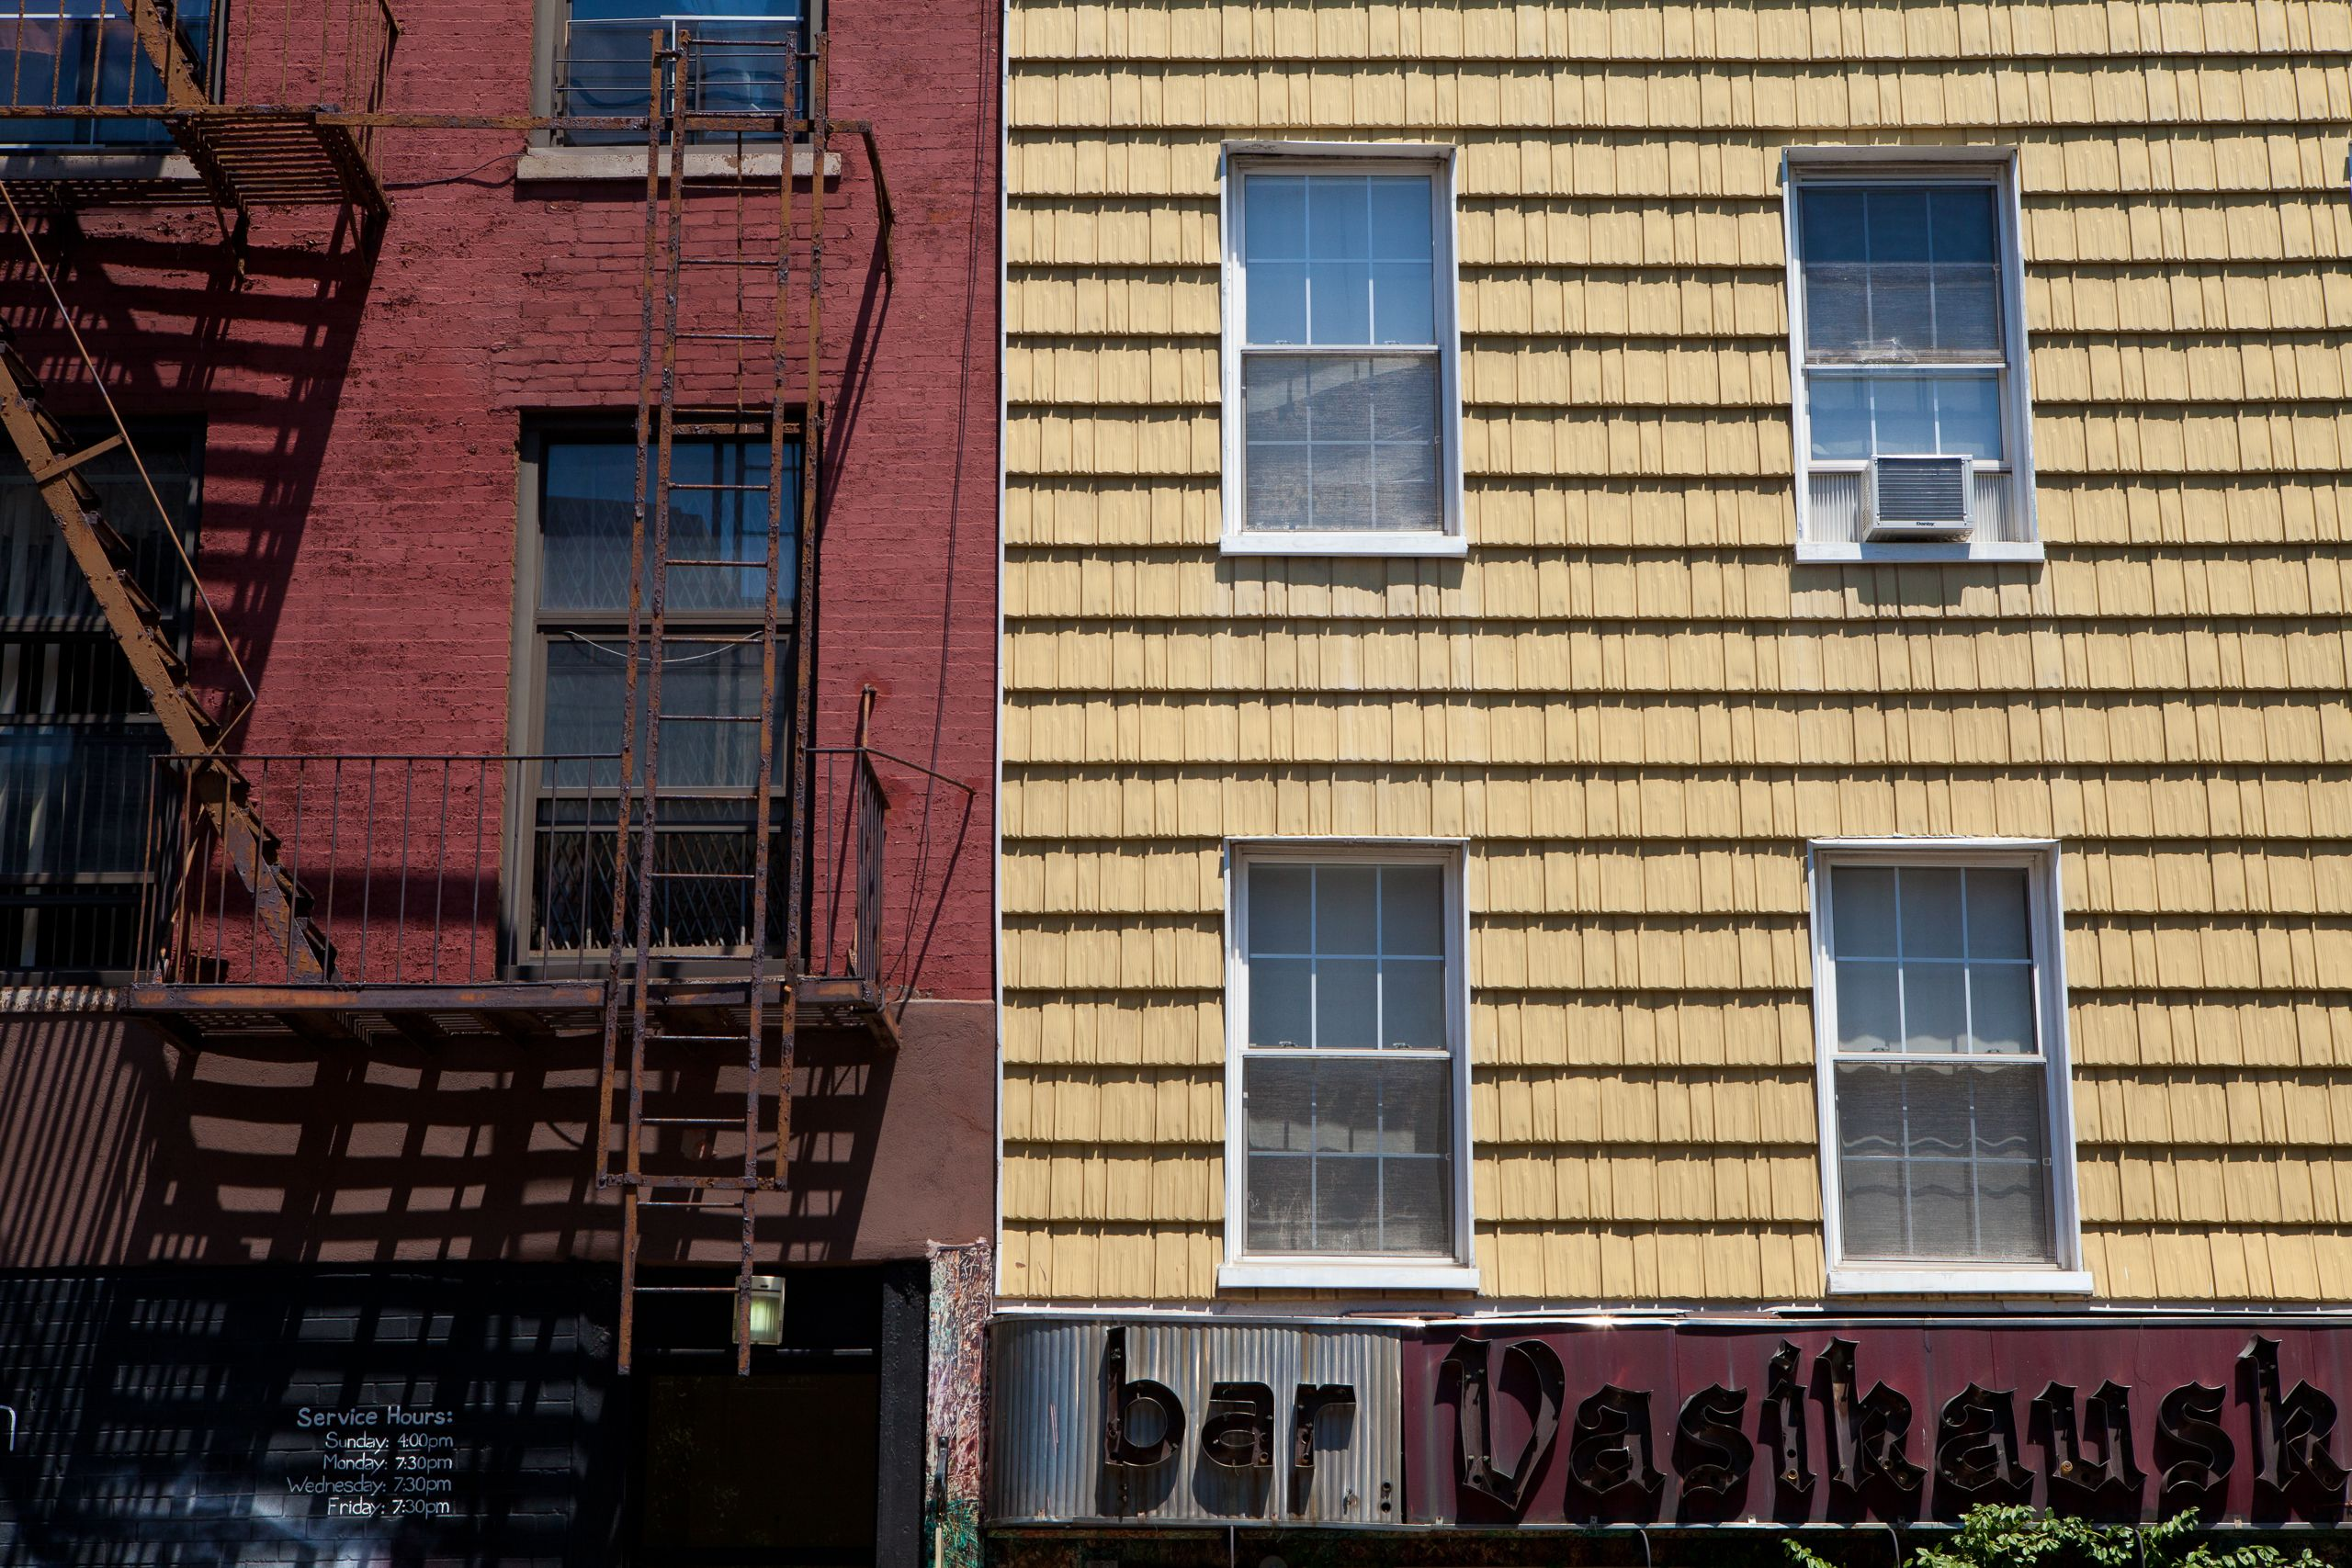 Williamsburg. Brooklyn New York